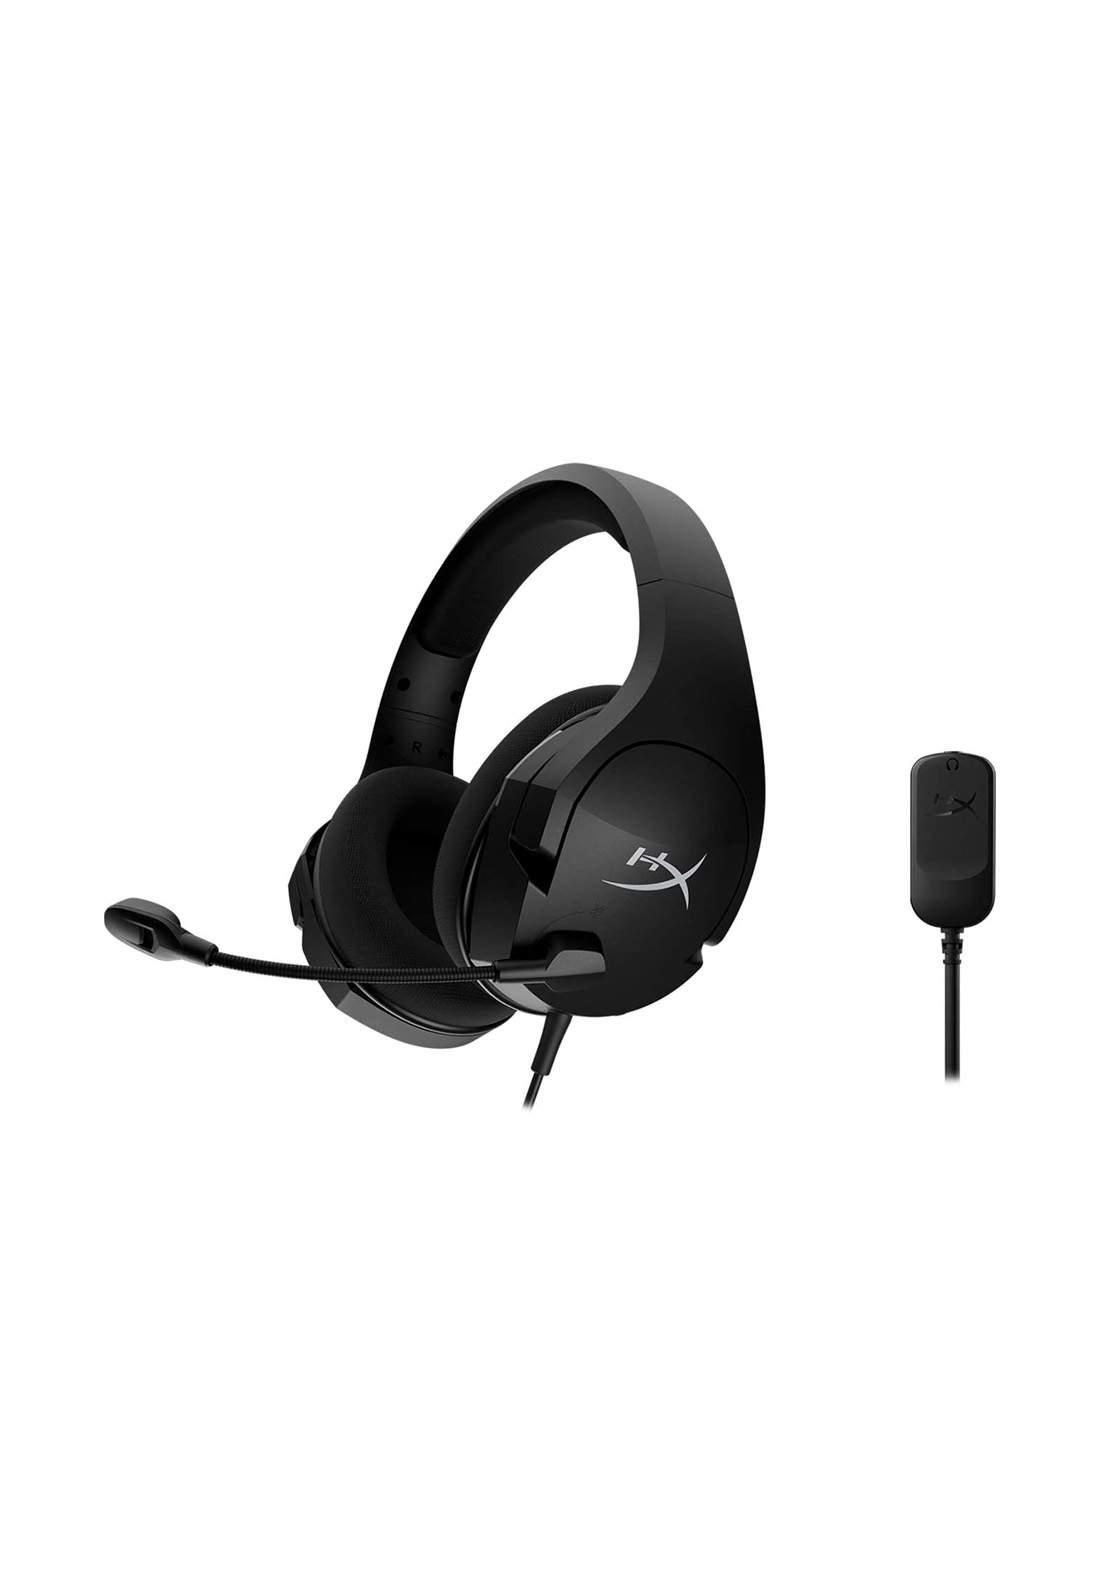 HyperX Cloud Stinger Core Gaming Headset - Black سماعة